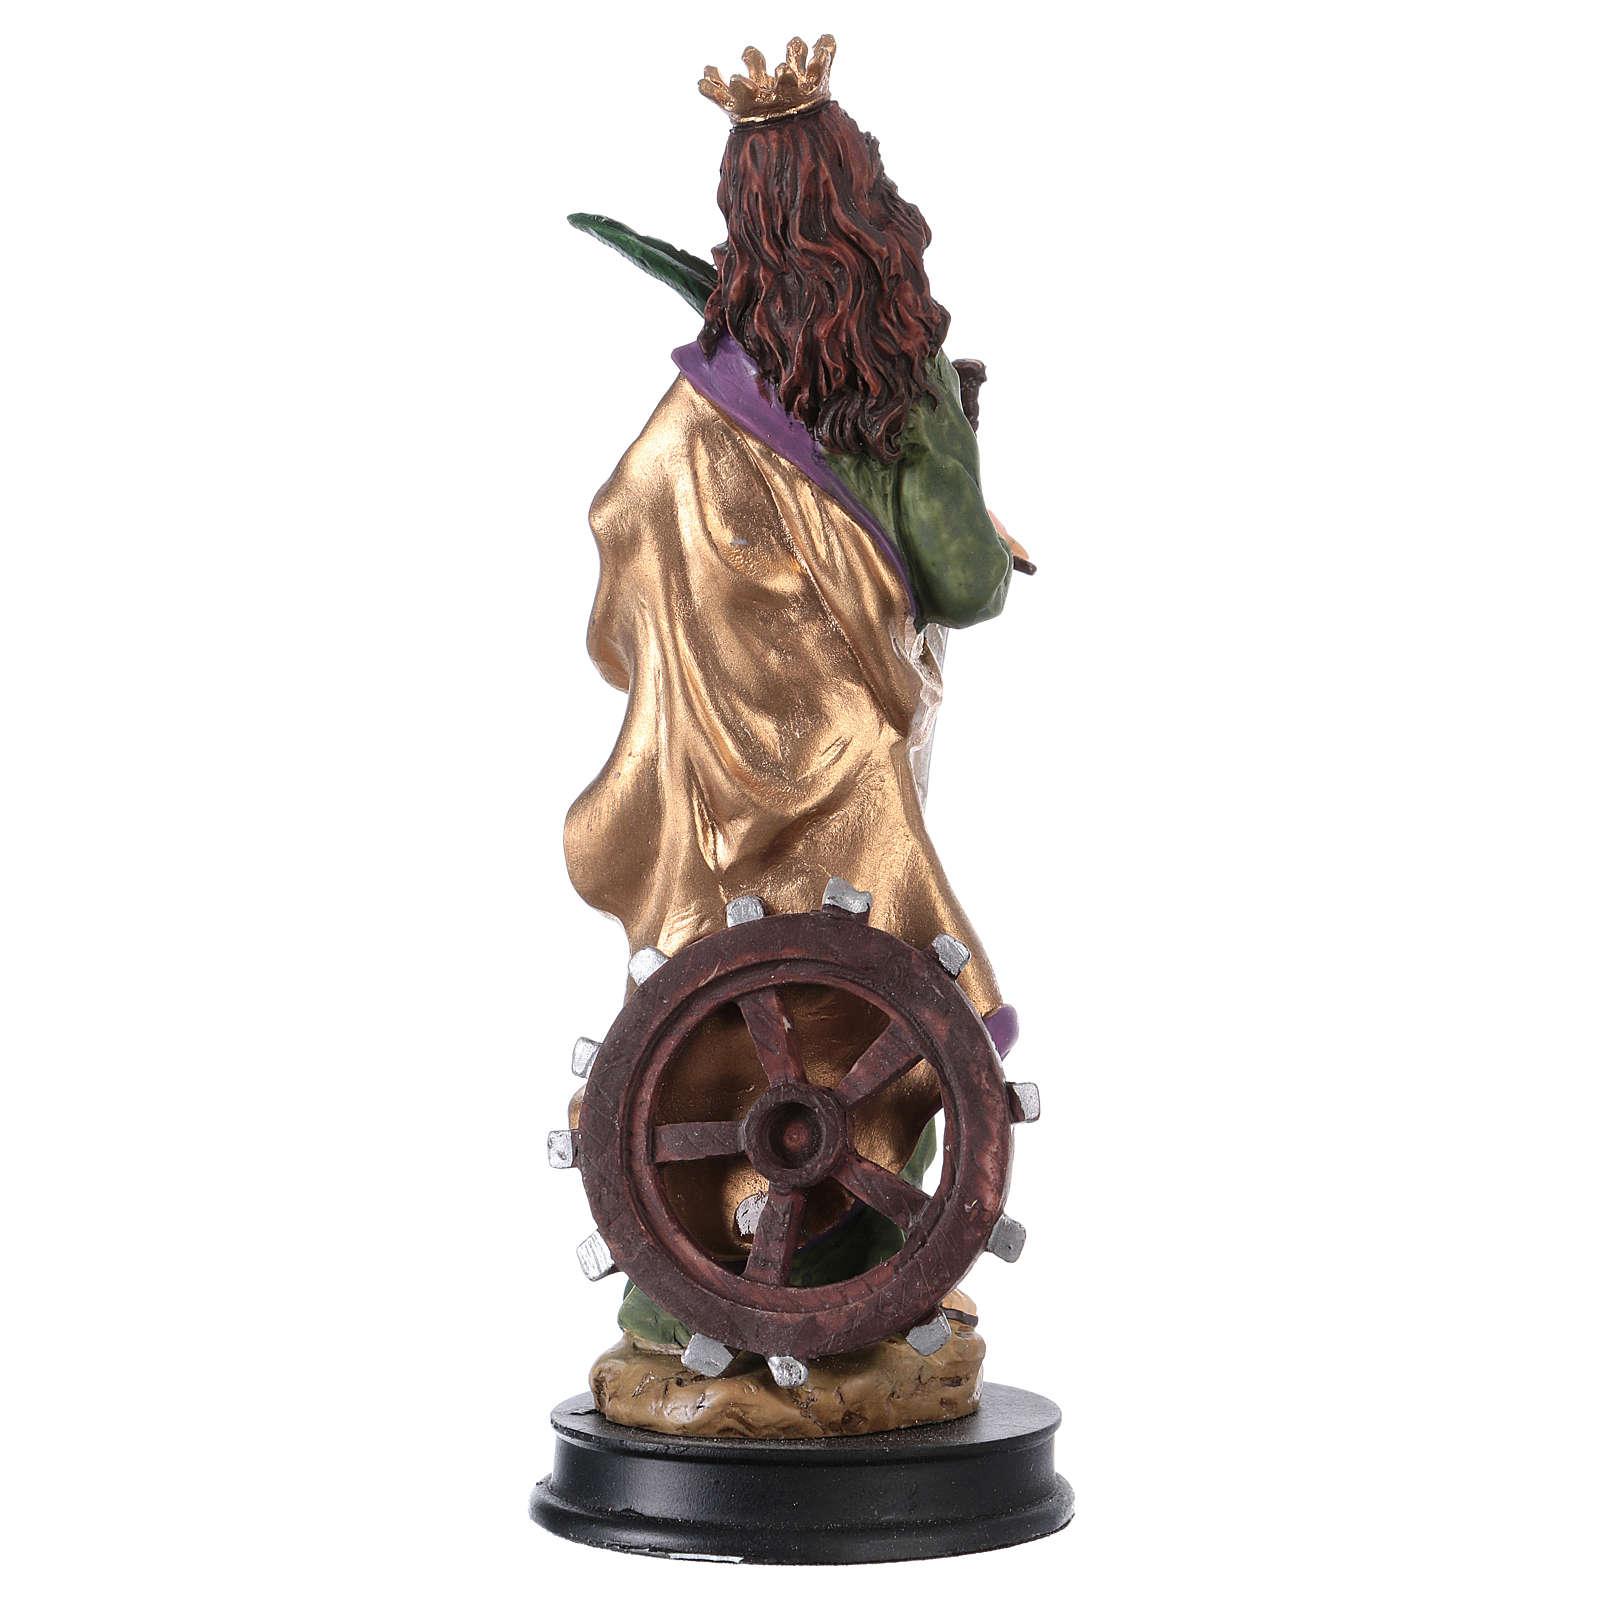 STOCK Statuette résine Sainte Catherine d'Alexandrie 13 cm 4